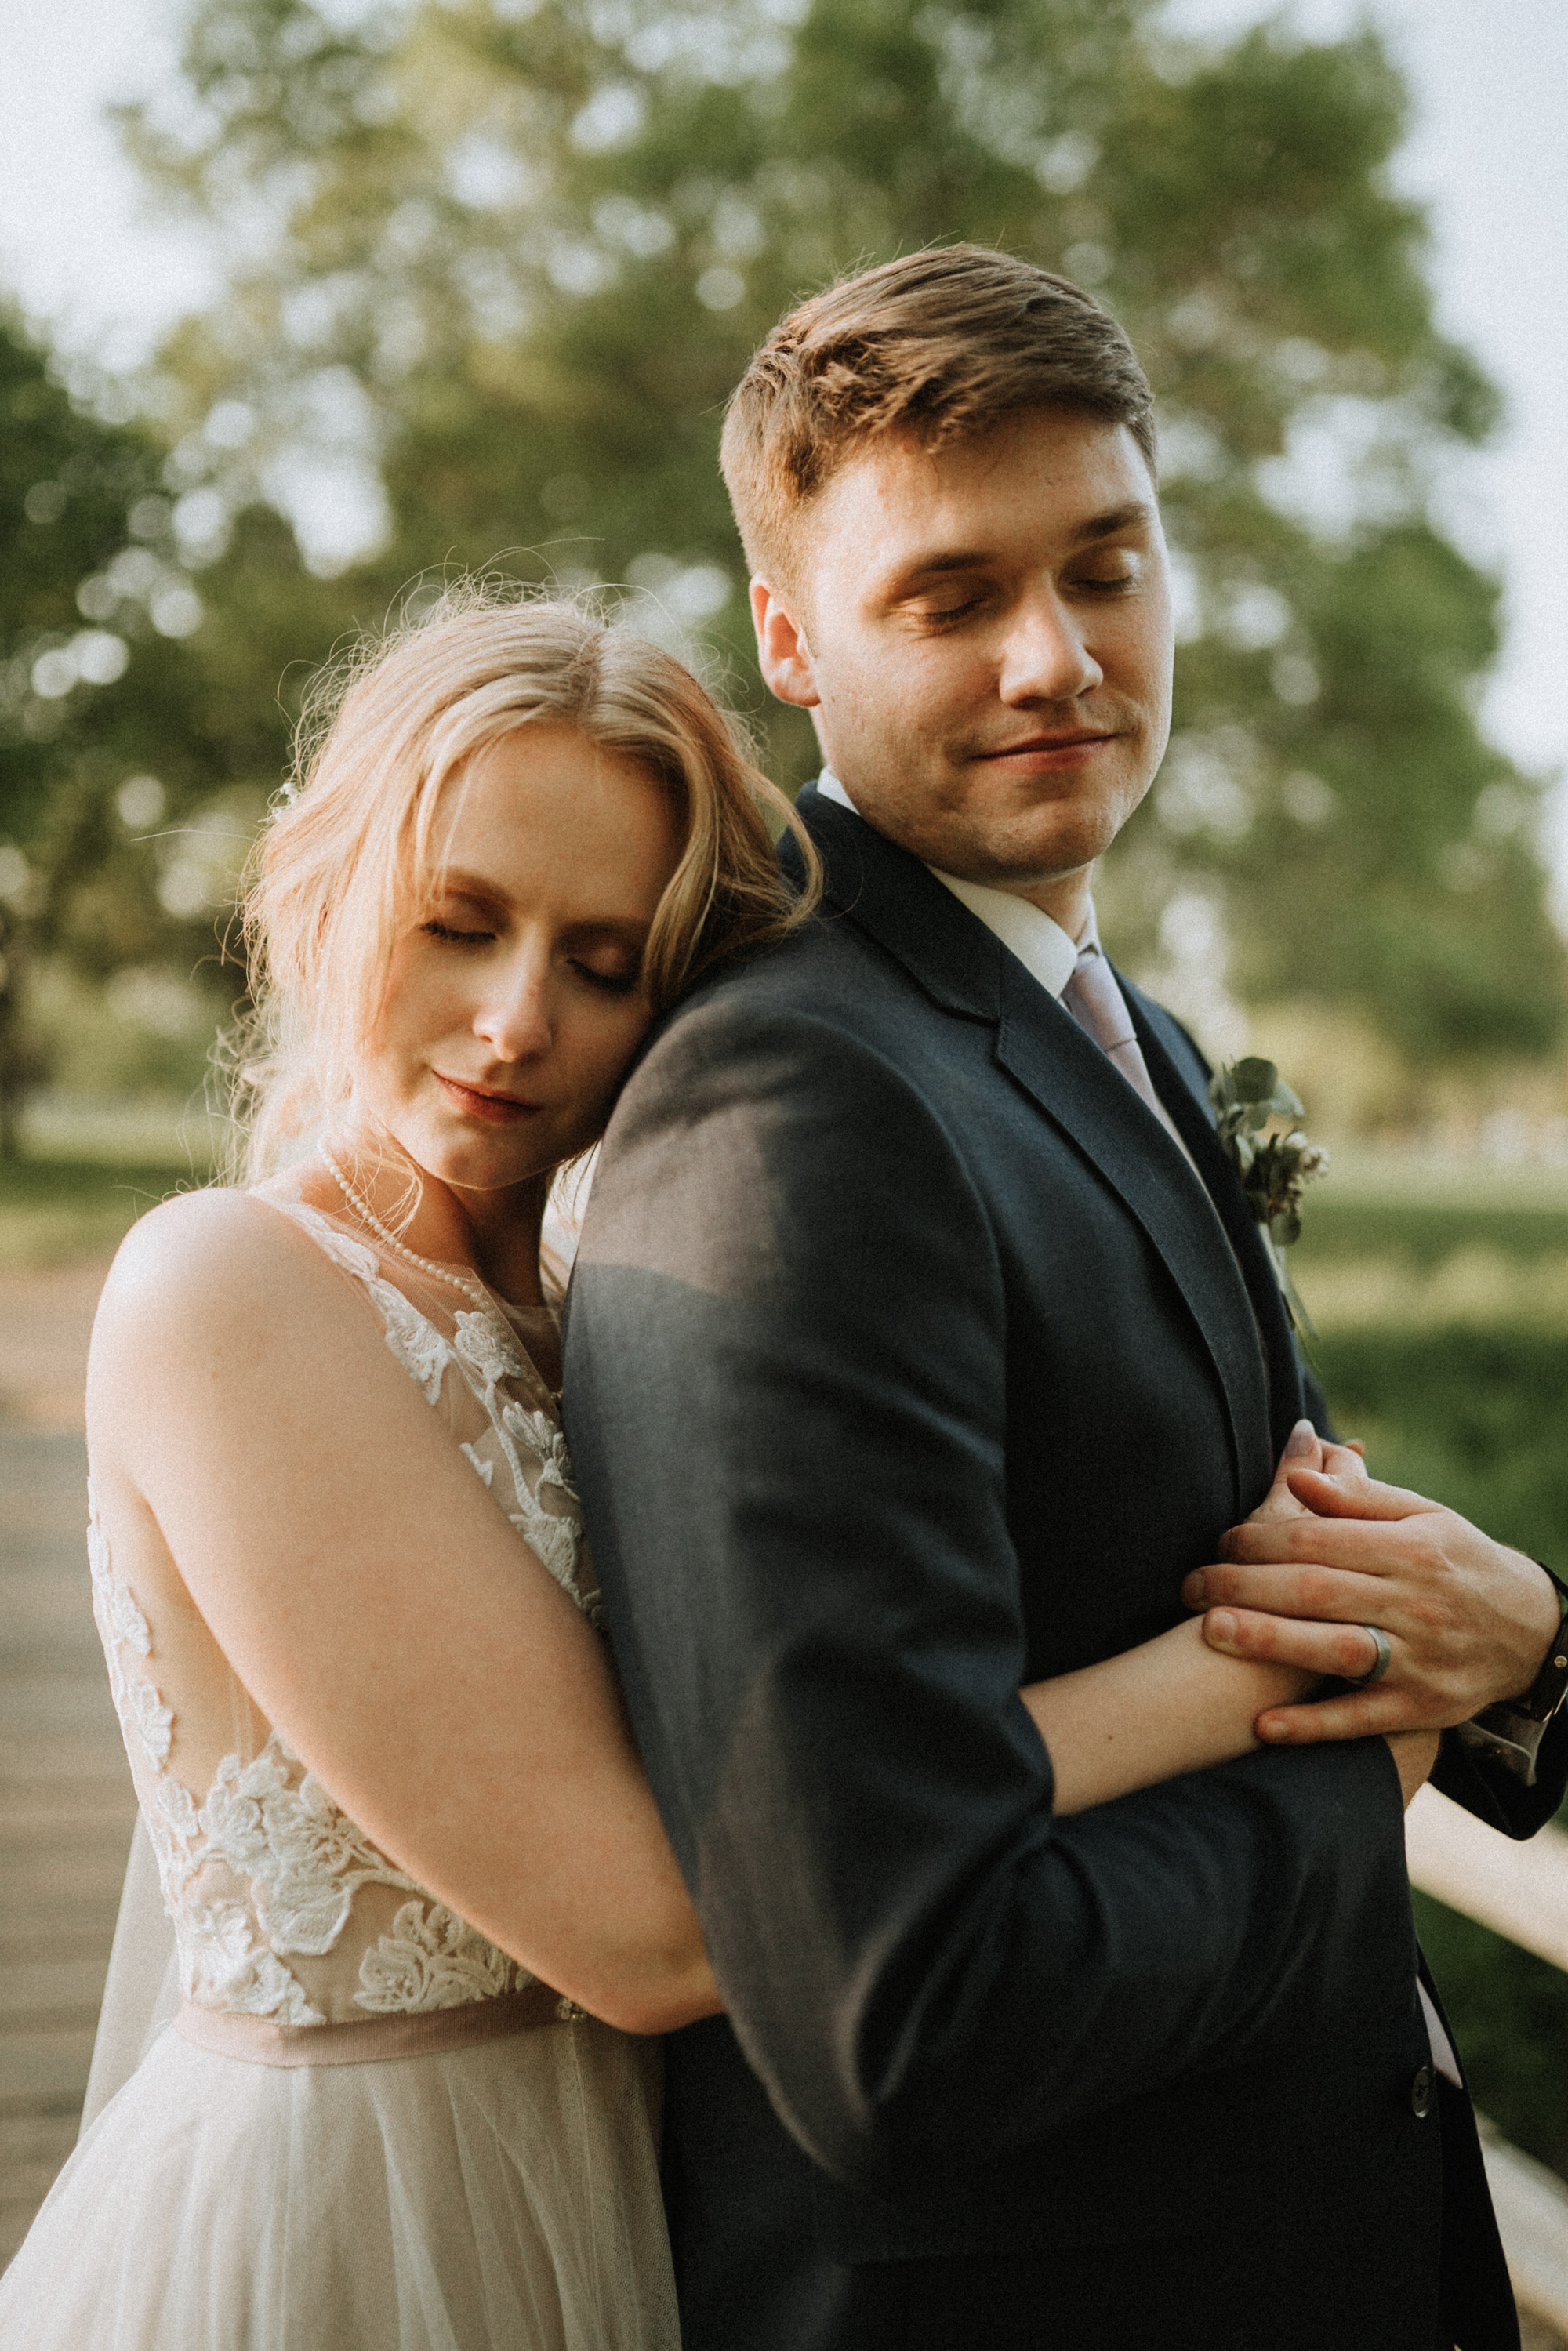 Wedding_(4_of_10).jpg